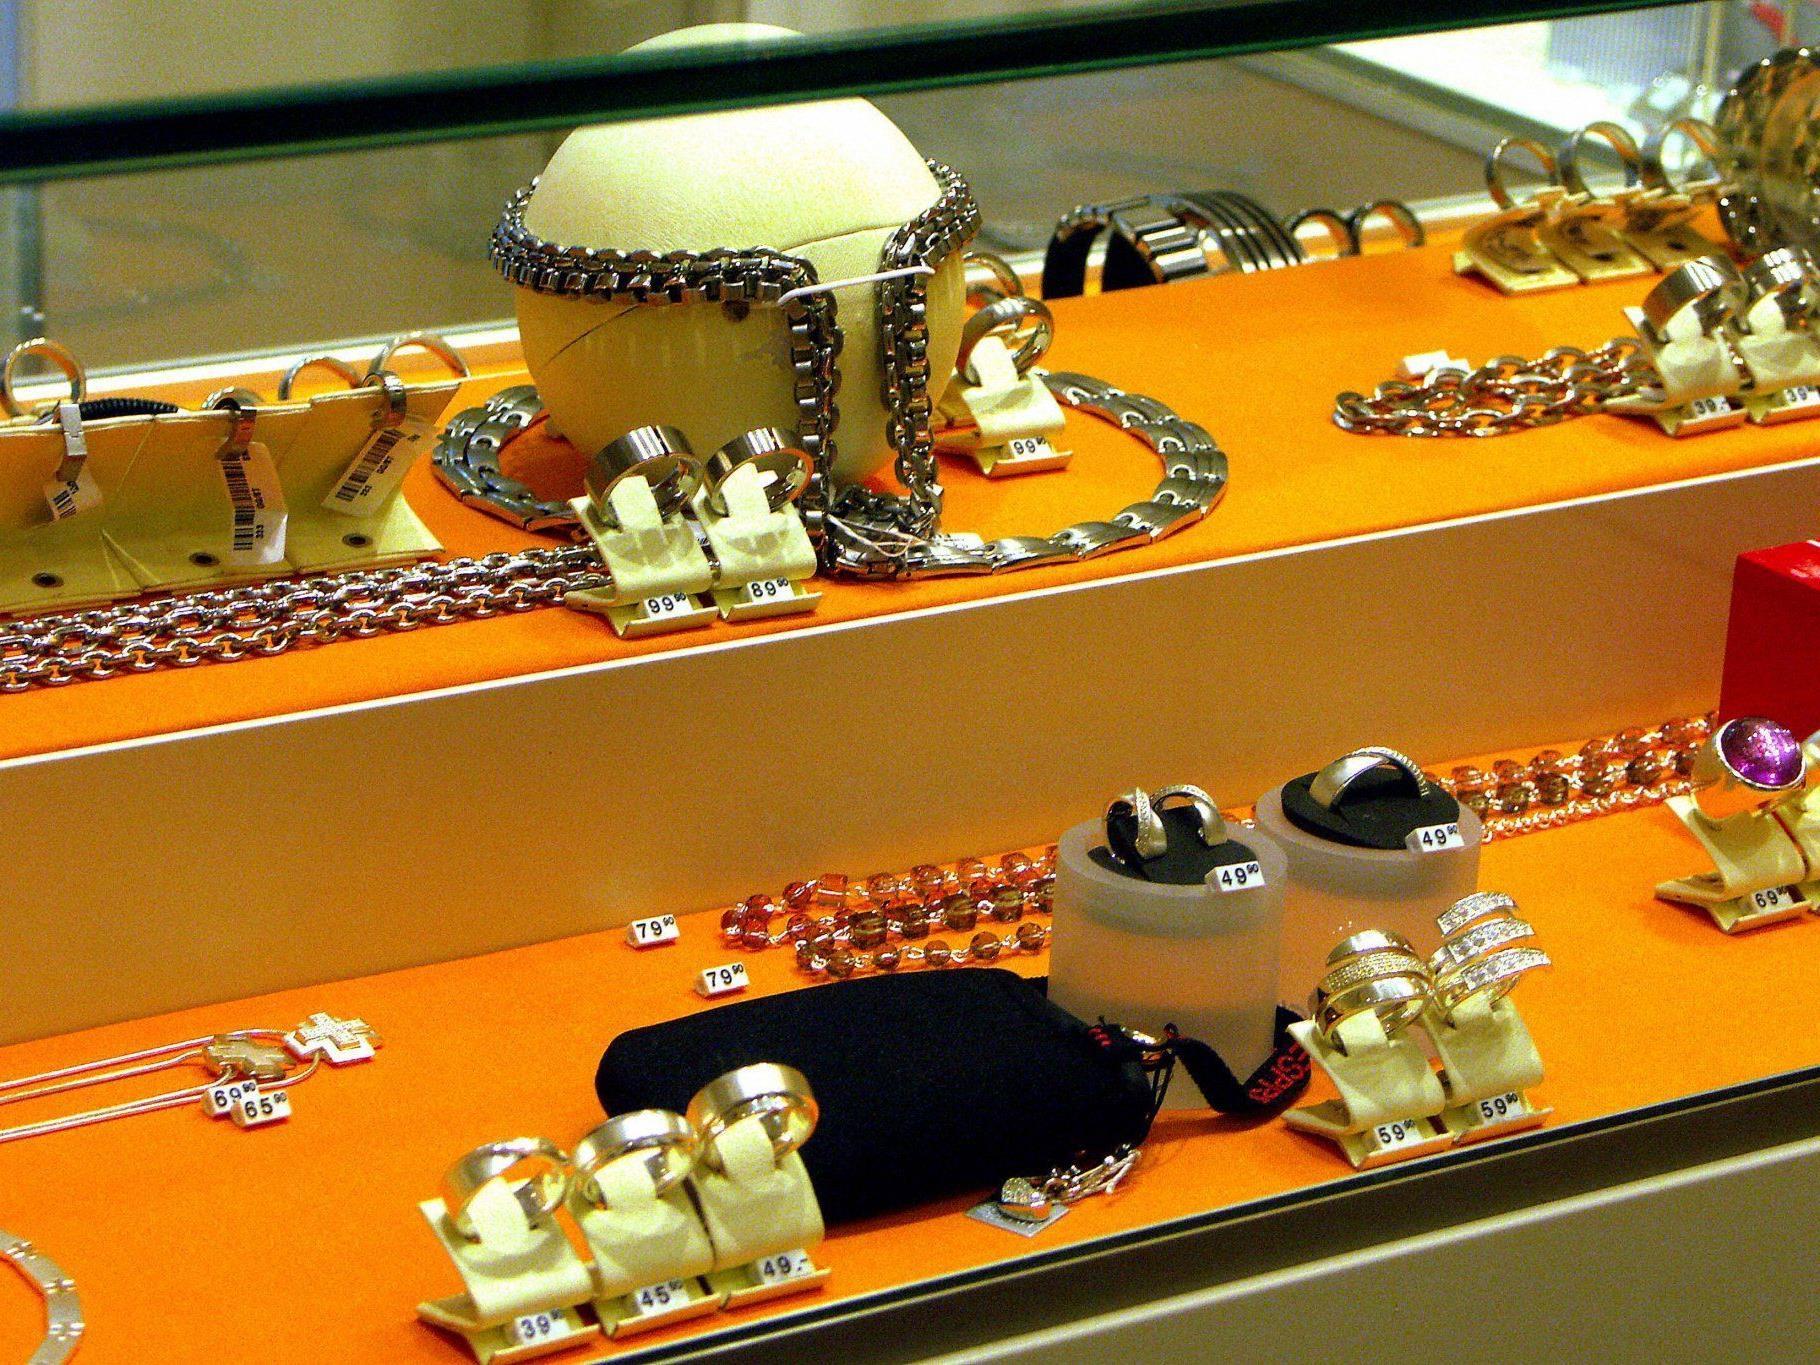 Juwelenraub mit Elektroschocker und Pfefferspray